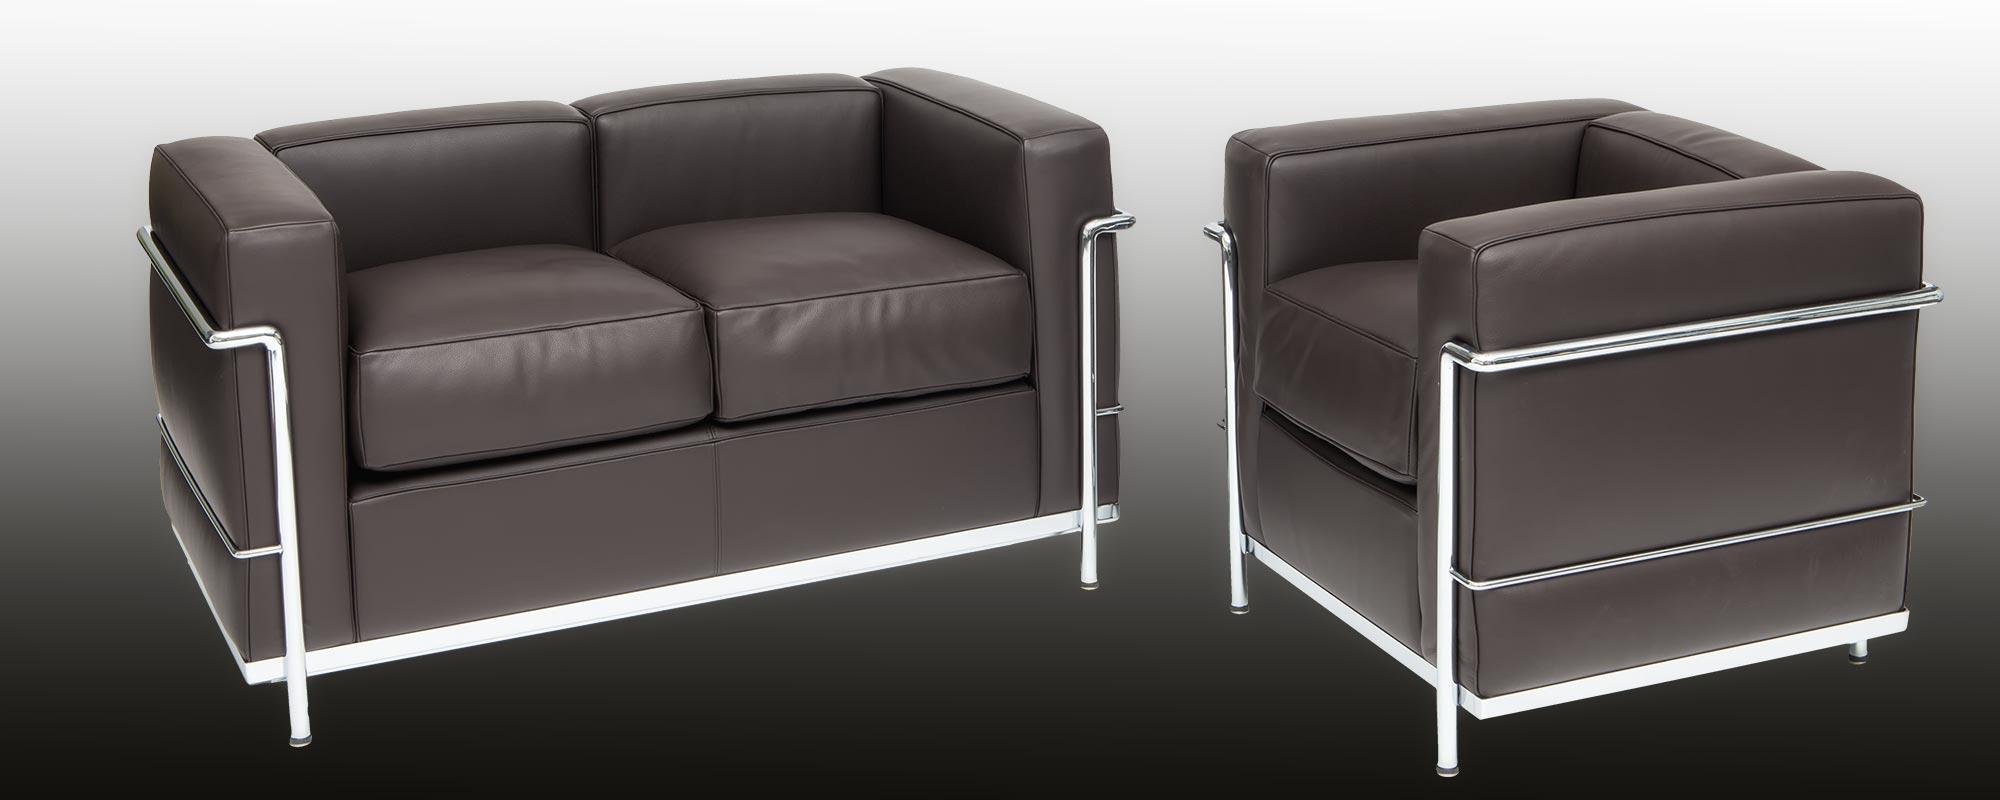 Corbusier designed Sofa LC 22 | steelform design classics